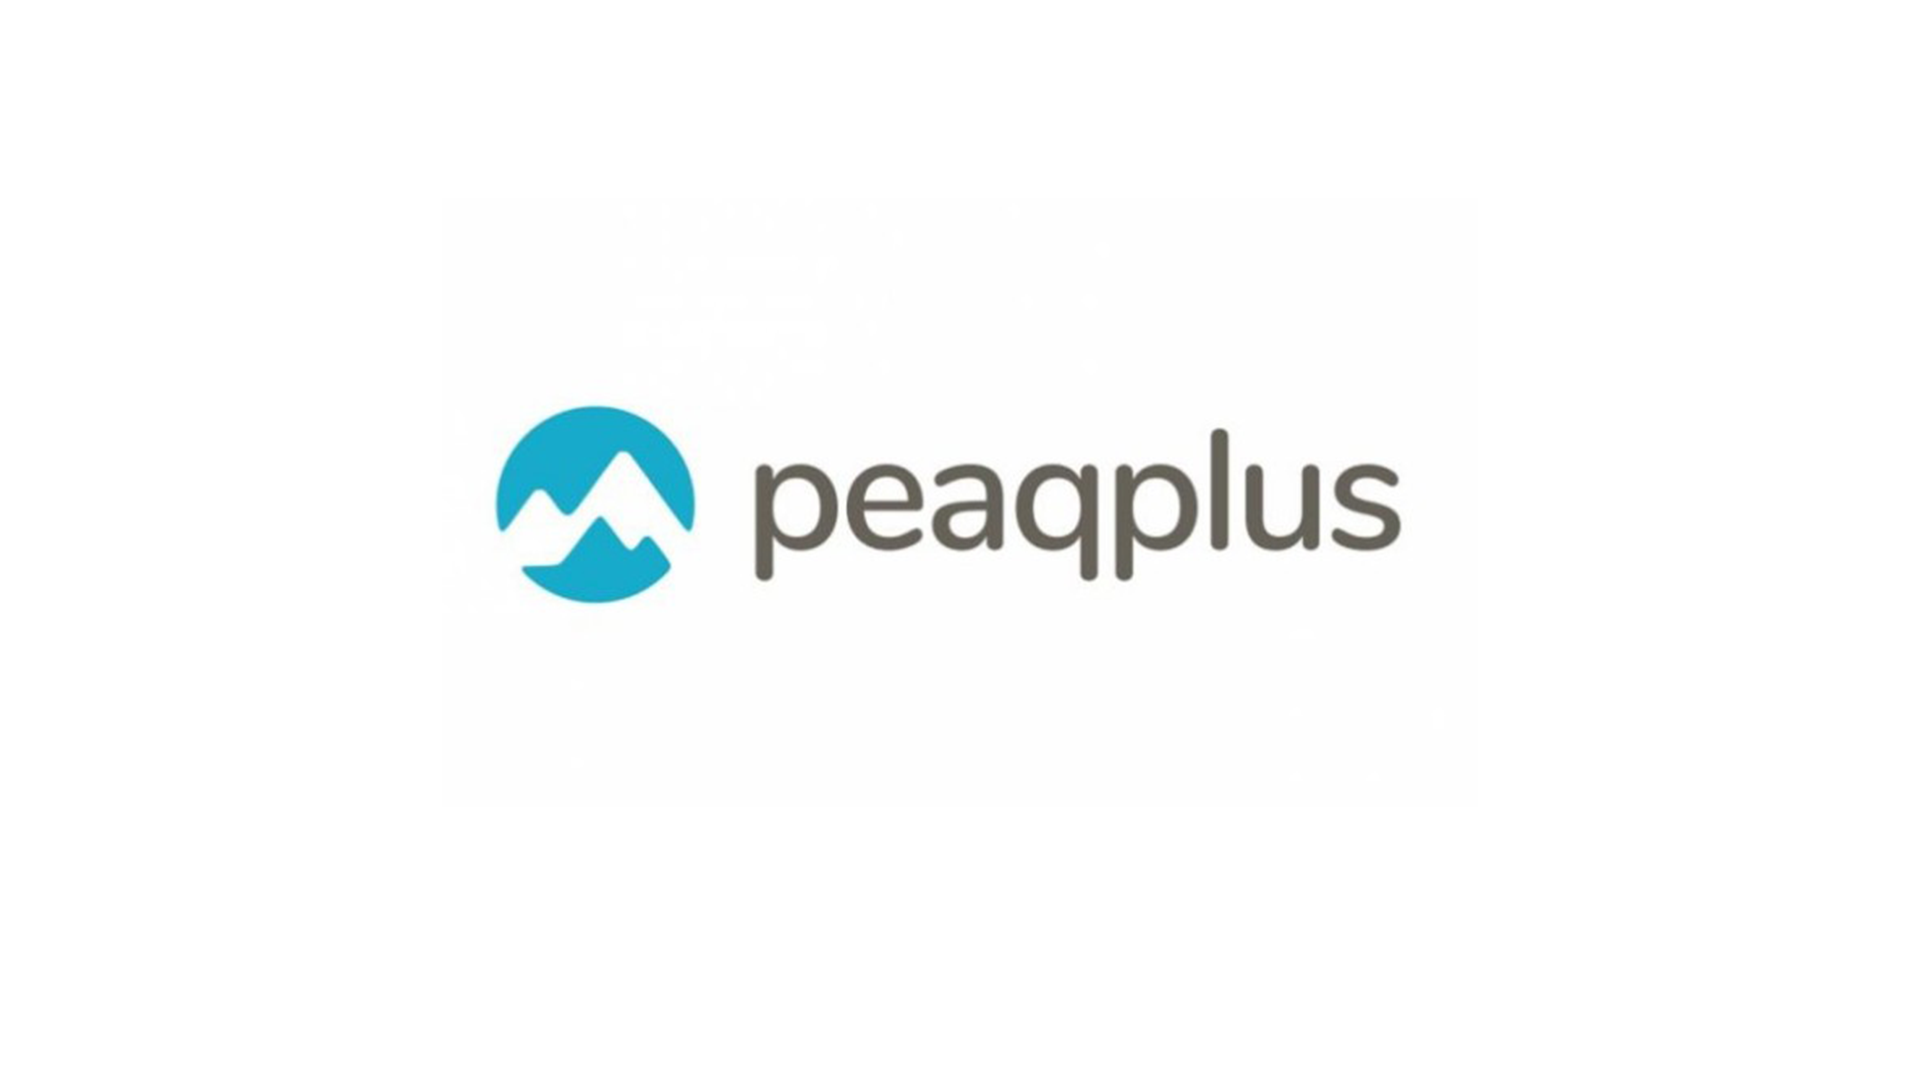 Peaqplus